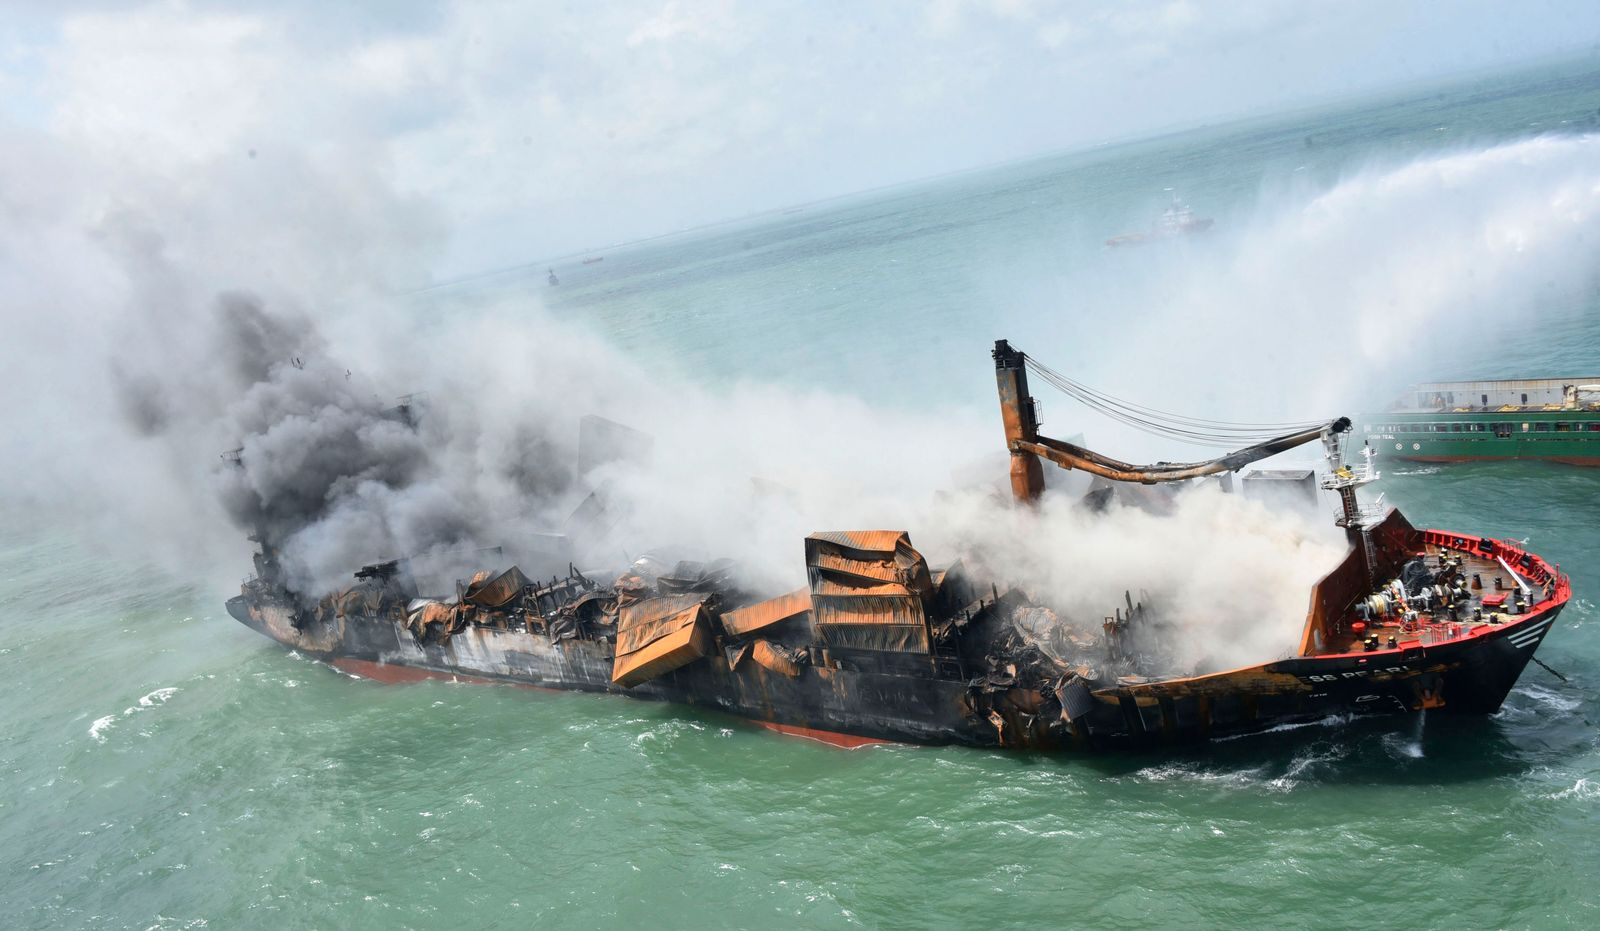 Schiffsbrand in Sri Lanka